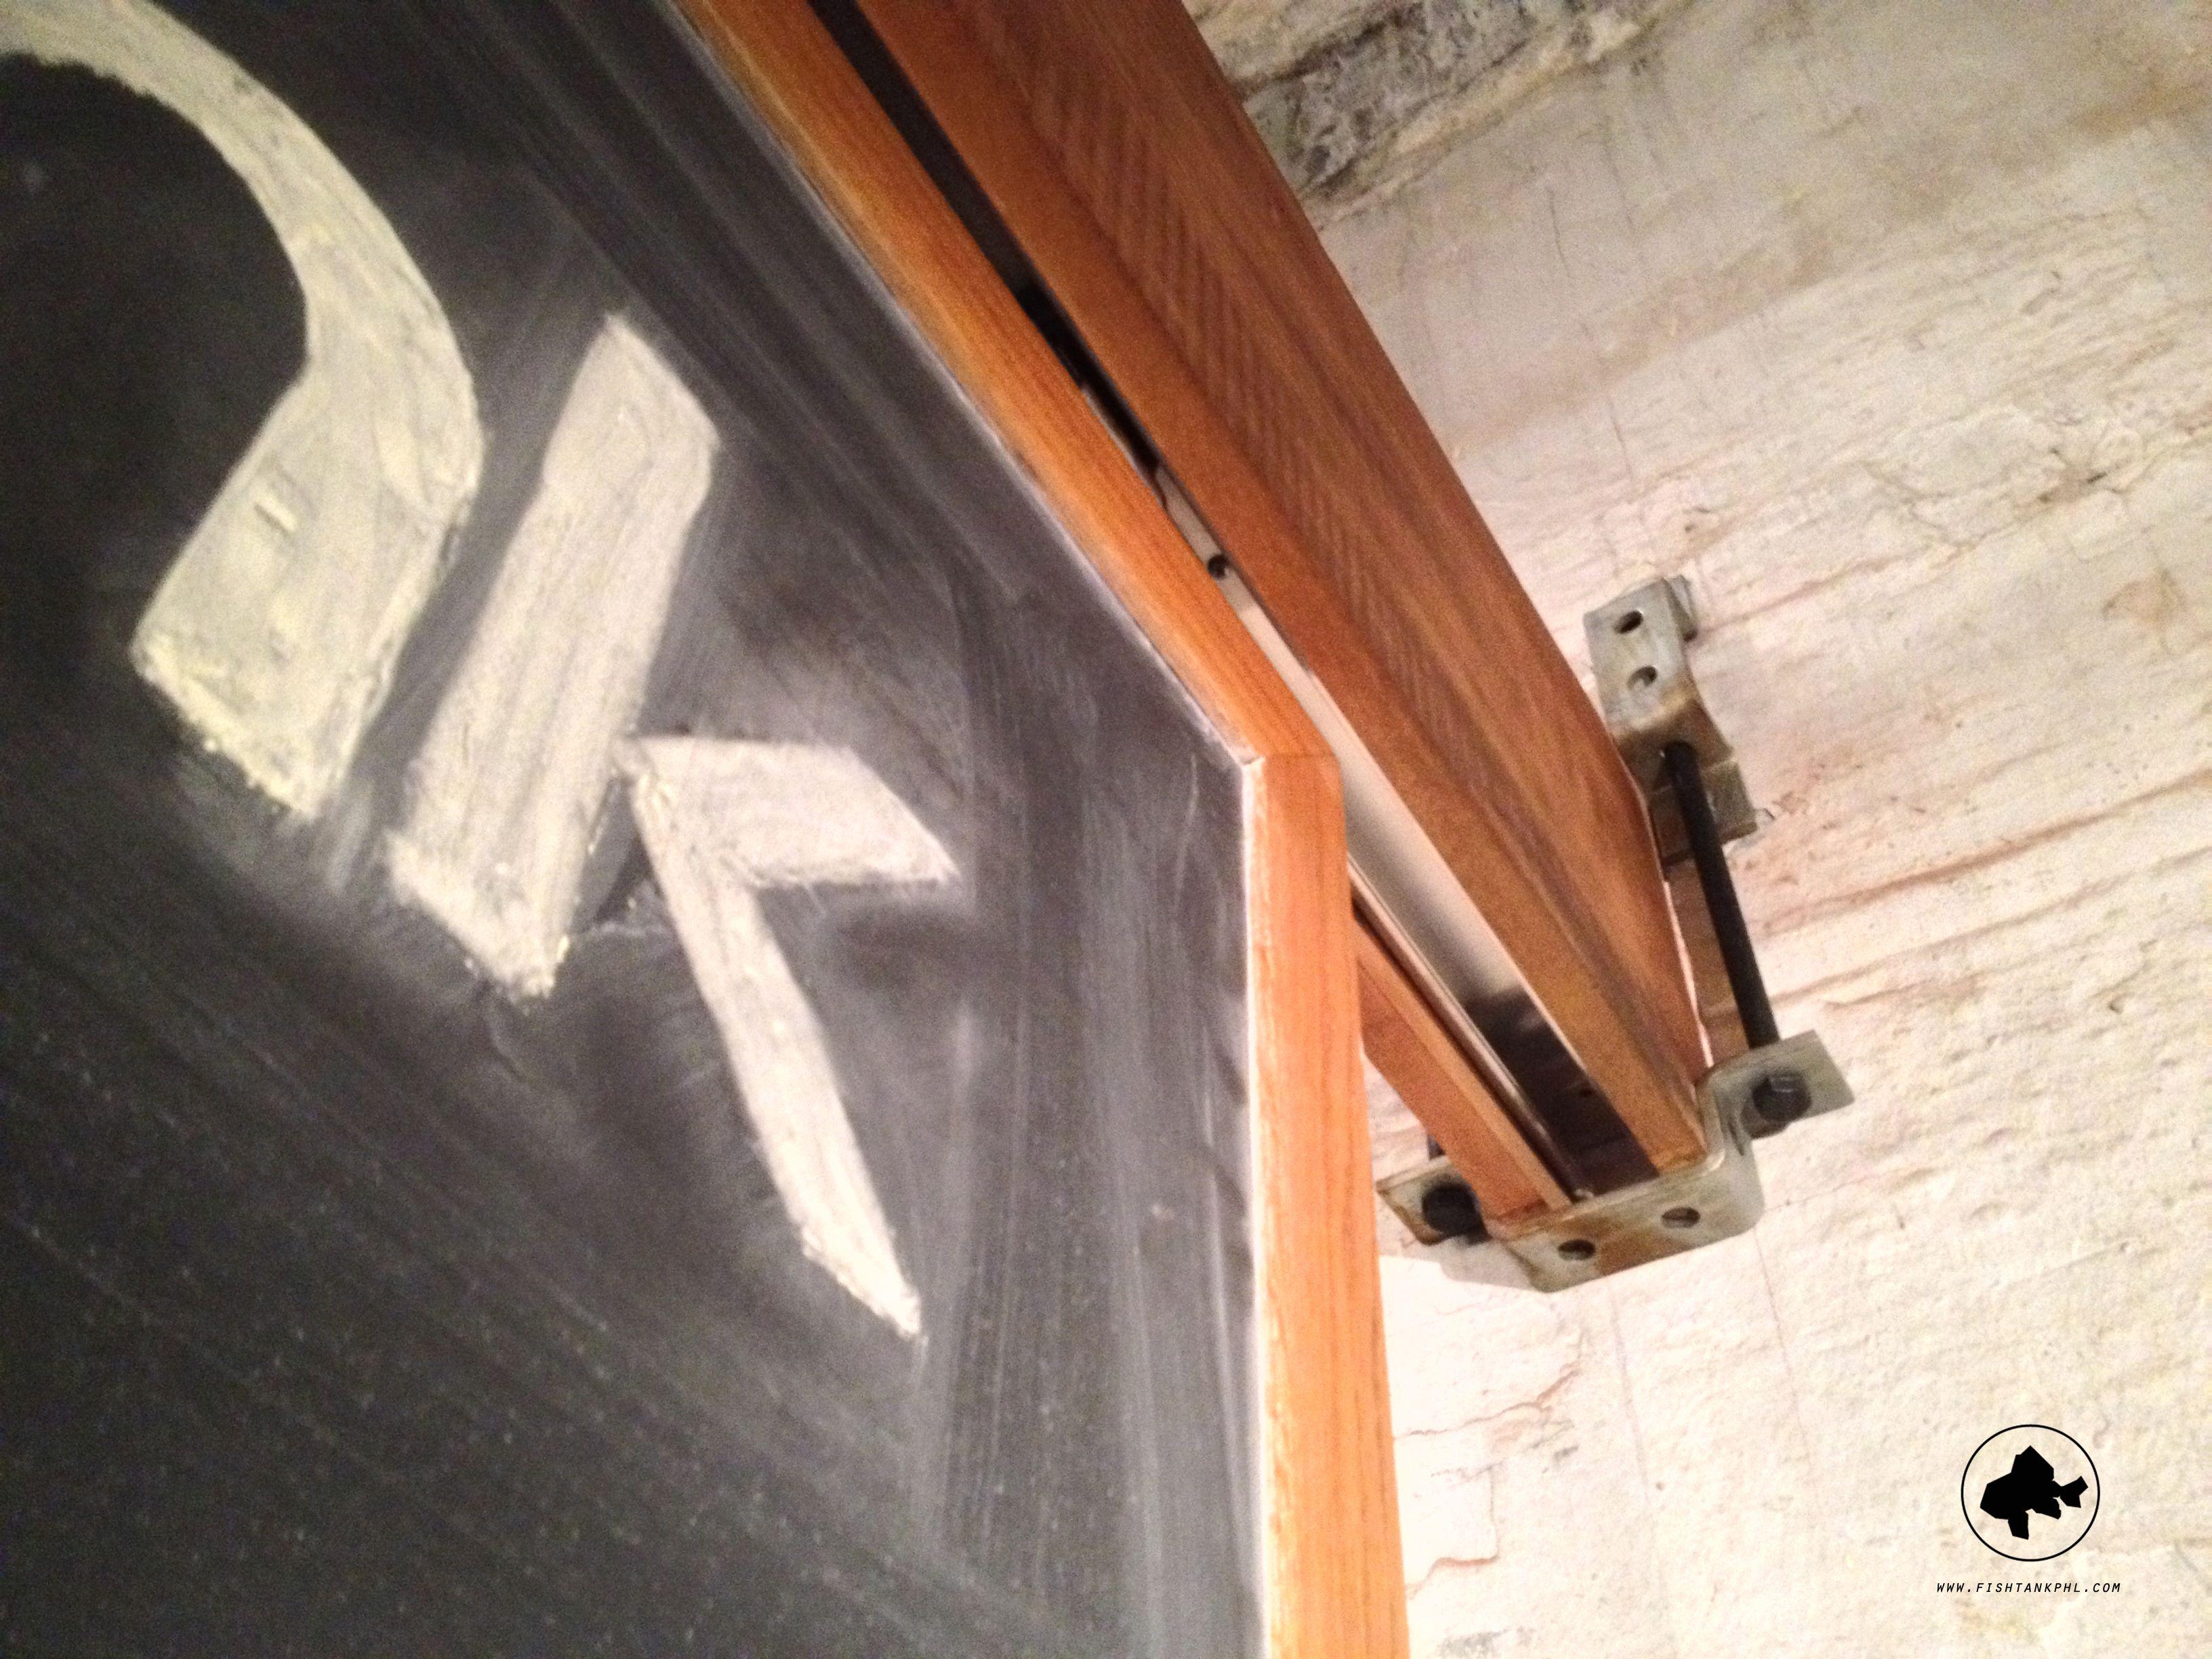 Chalkboard sliding door room divider using pocket door